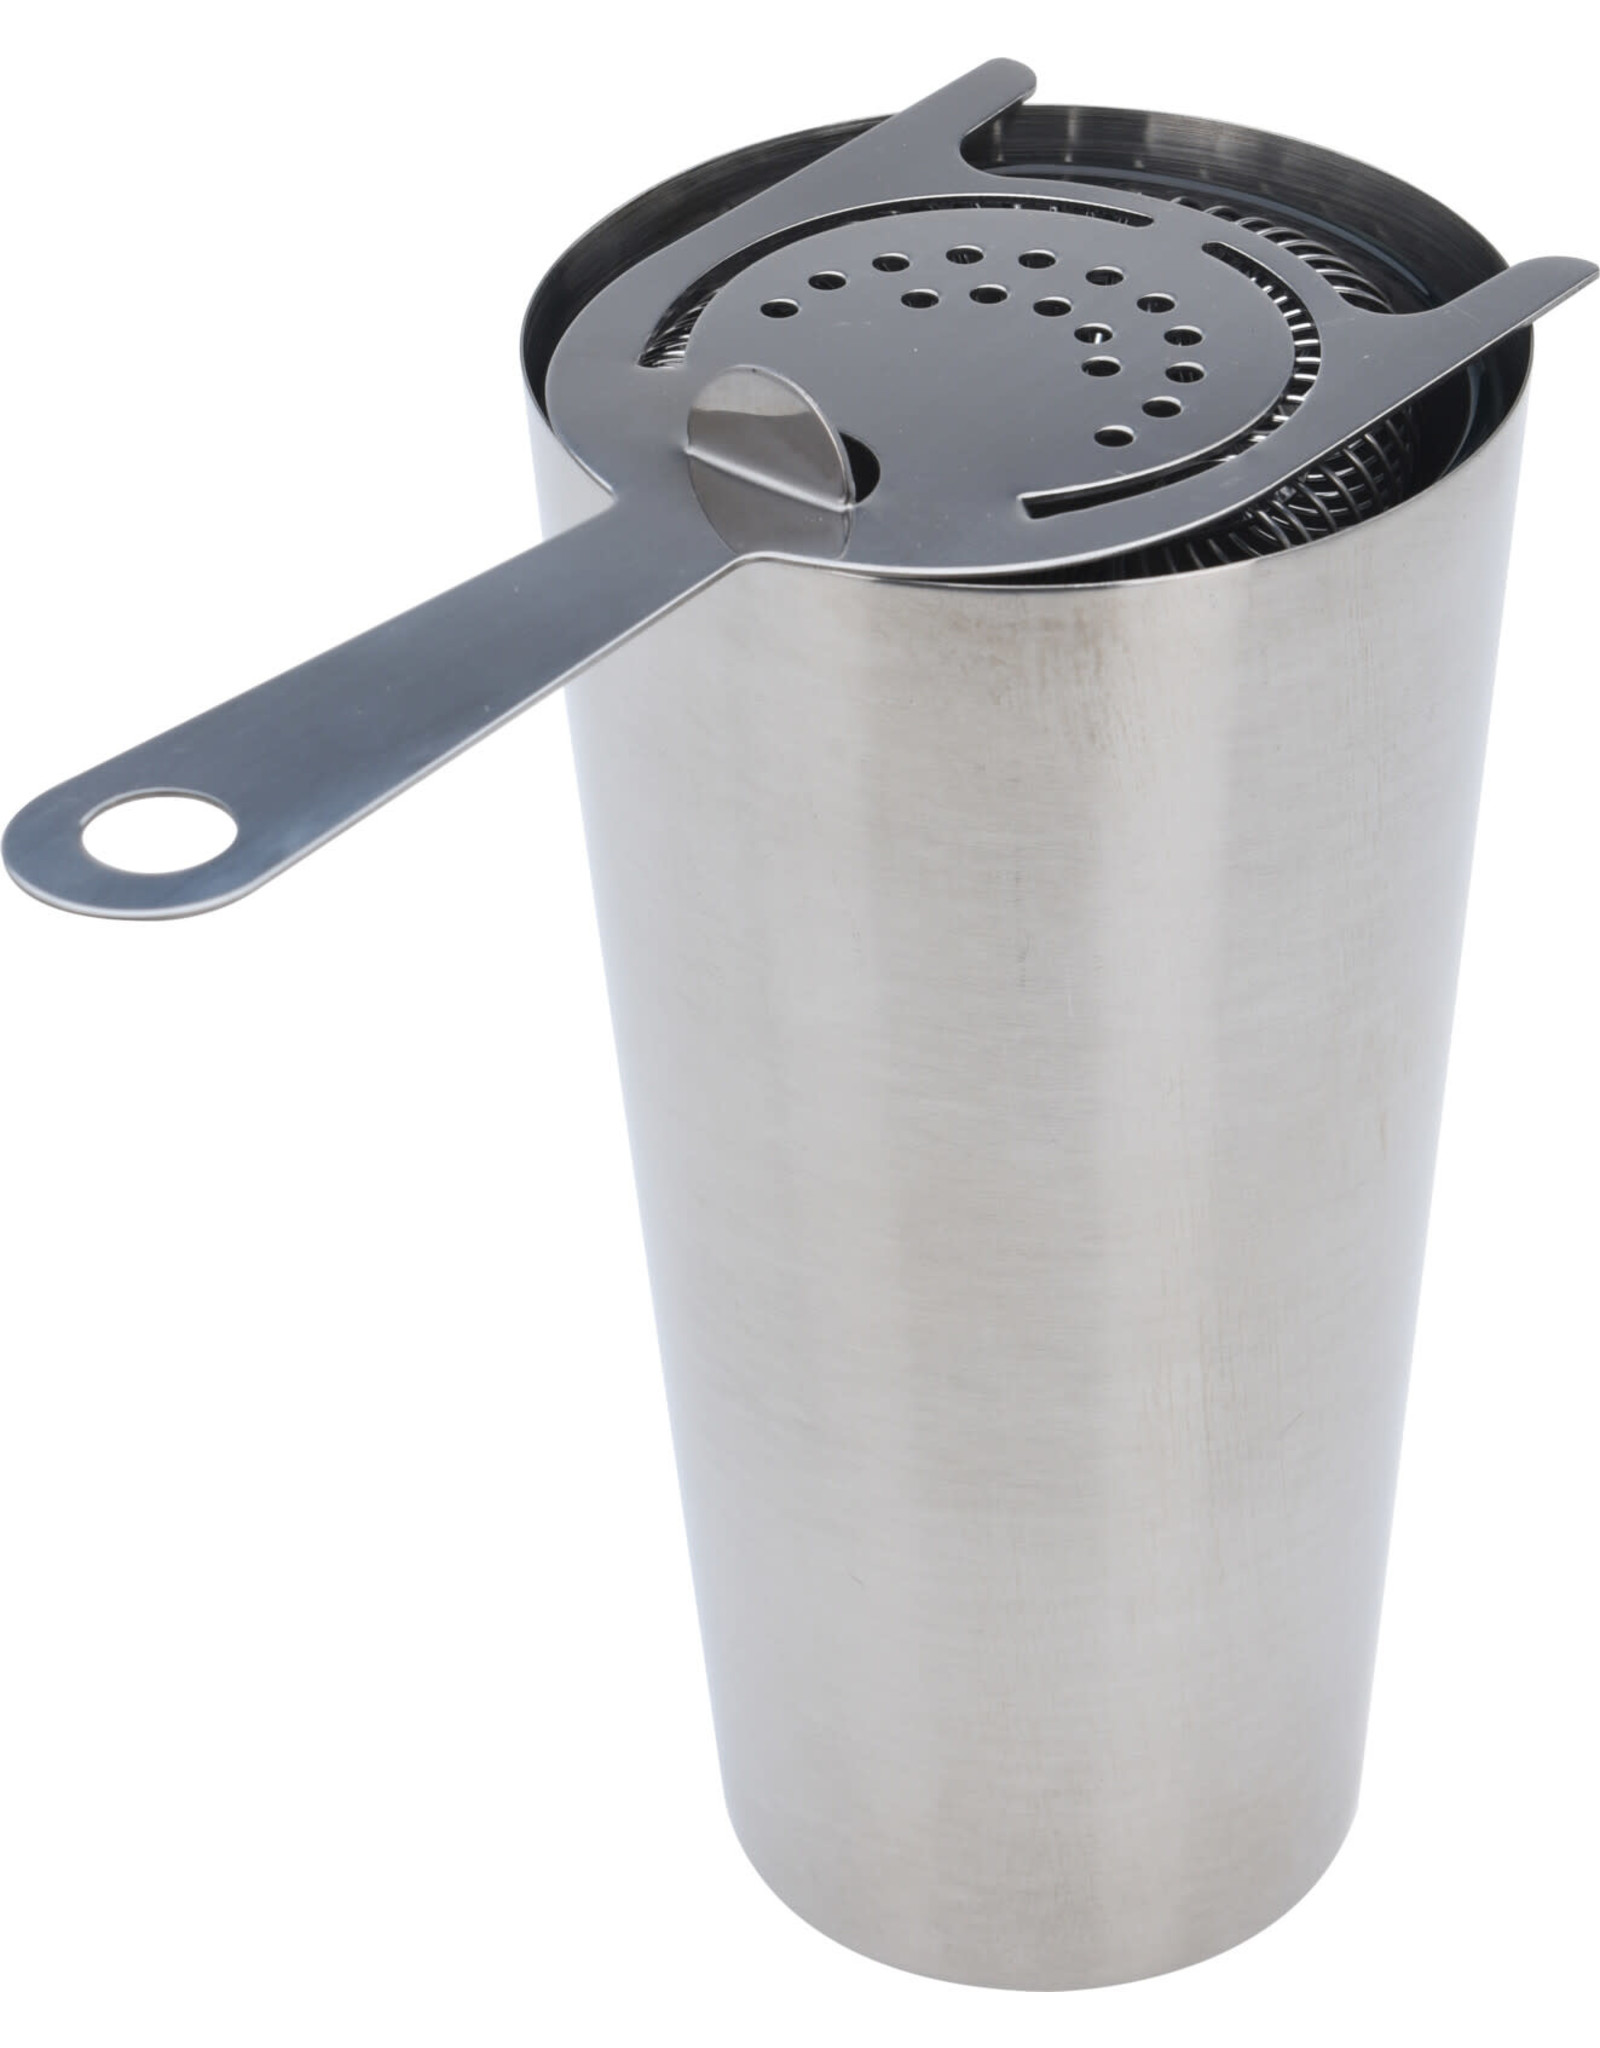 Koopman Cocktail Shaker Set Glass